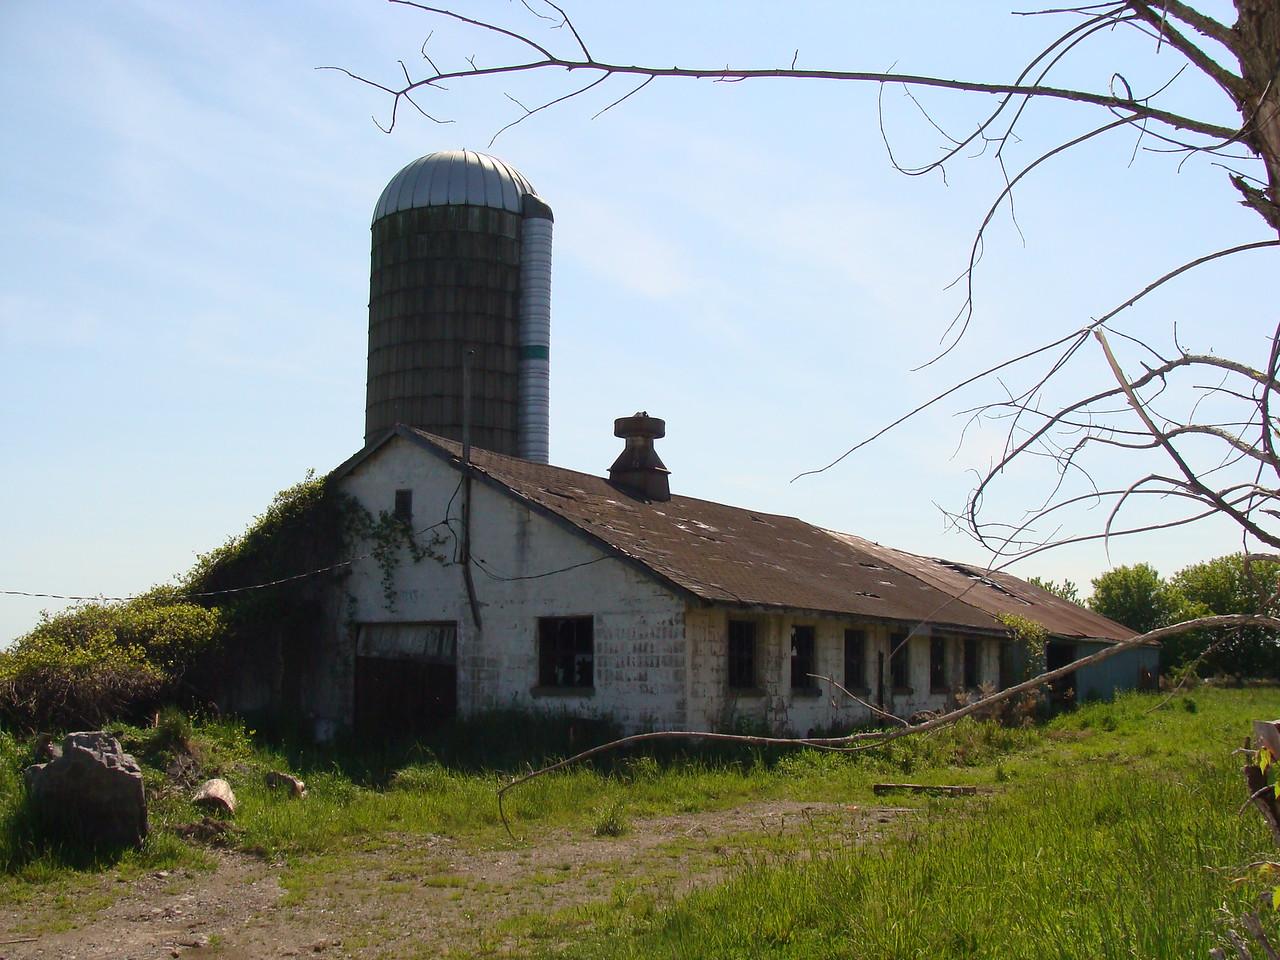 Milking Barn and Silo